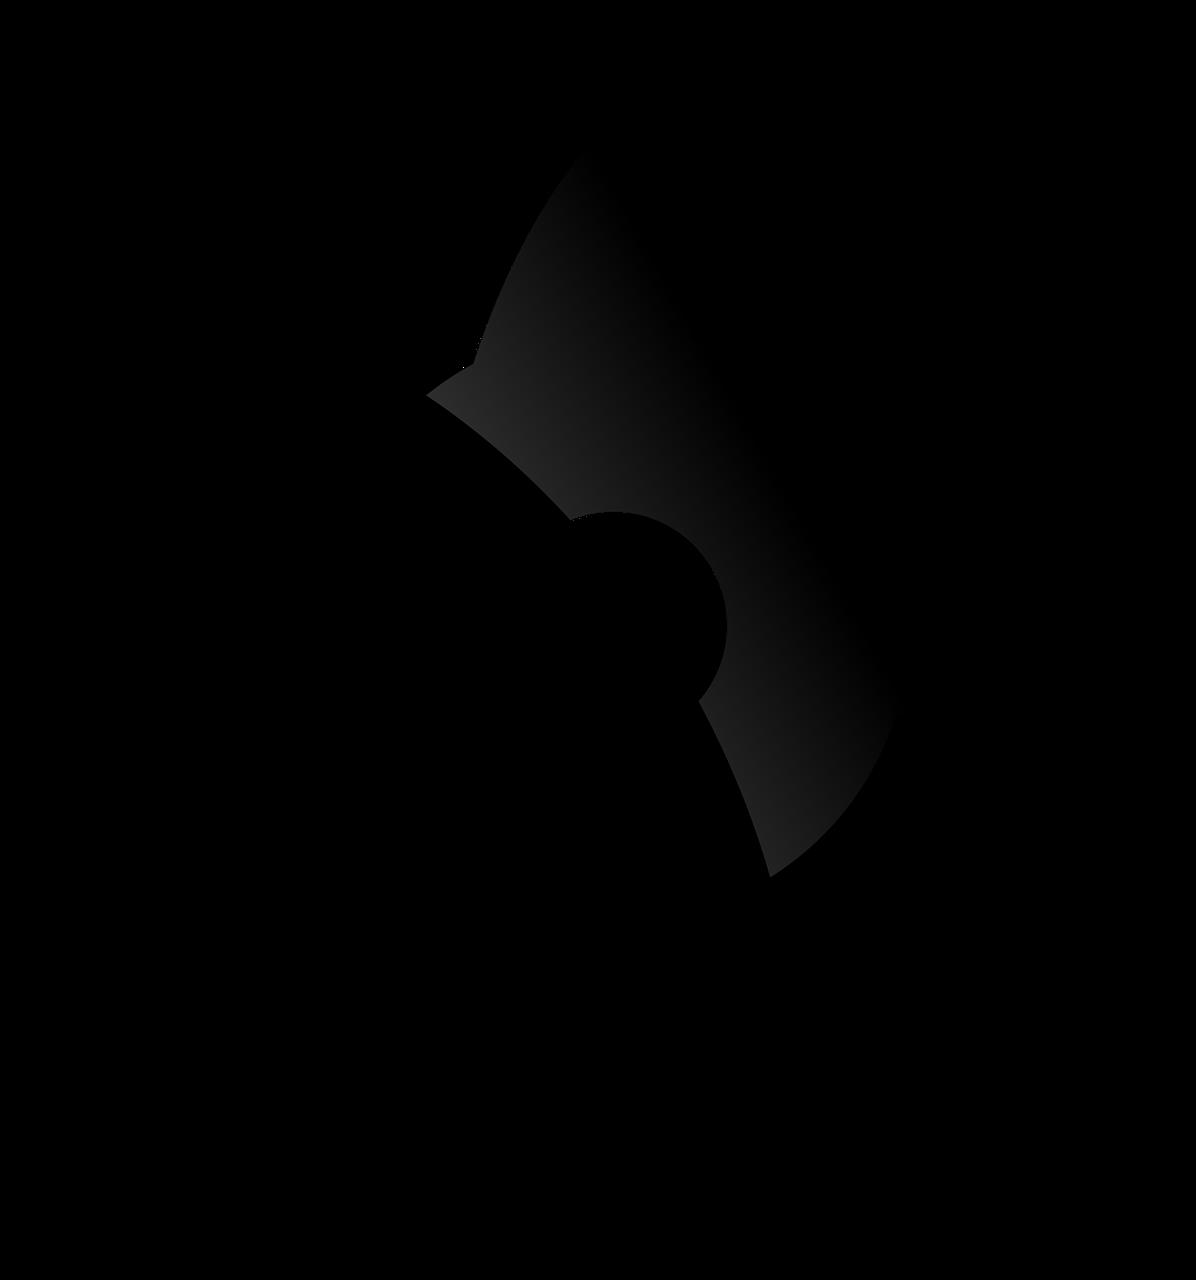 wurfstern, ninja, graphic-1741226.jpg